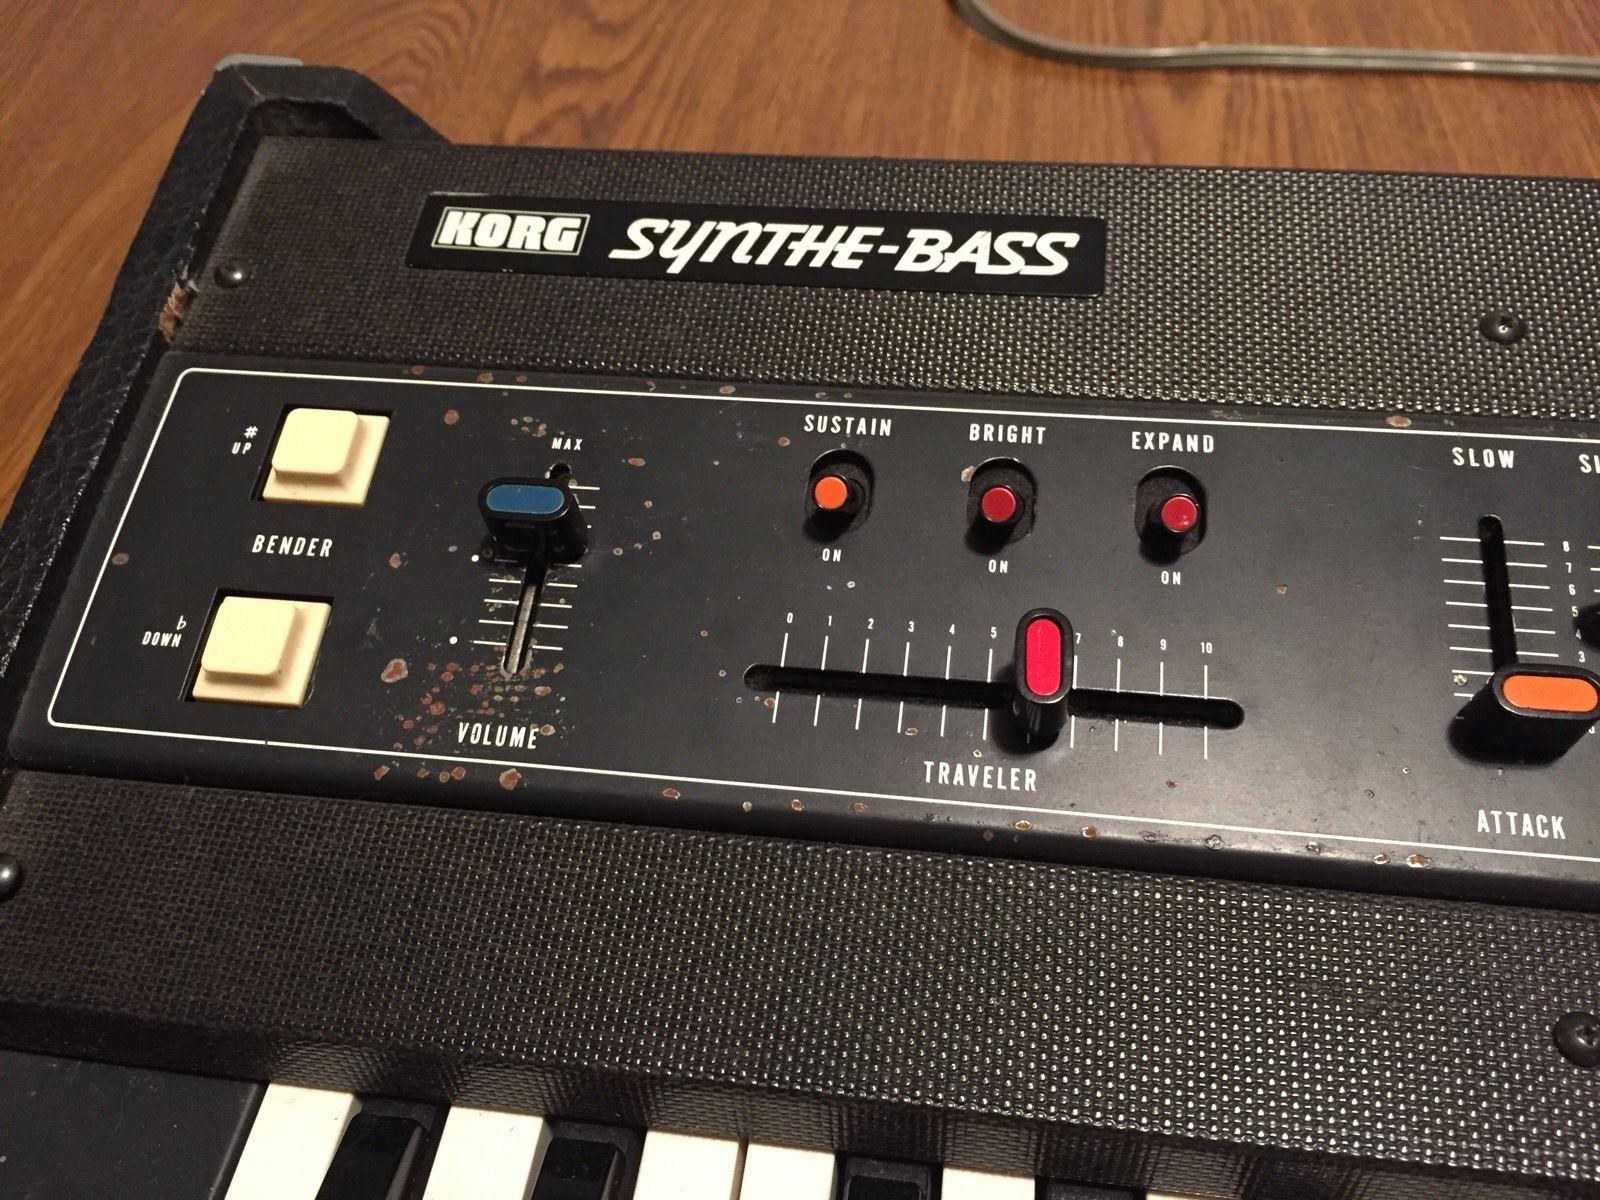 MATRIXSYNTH: Korg Synthe-Bass SB-100 Analog Synthesizer SN